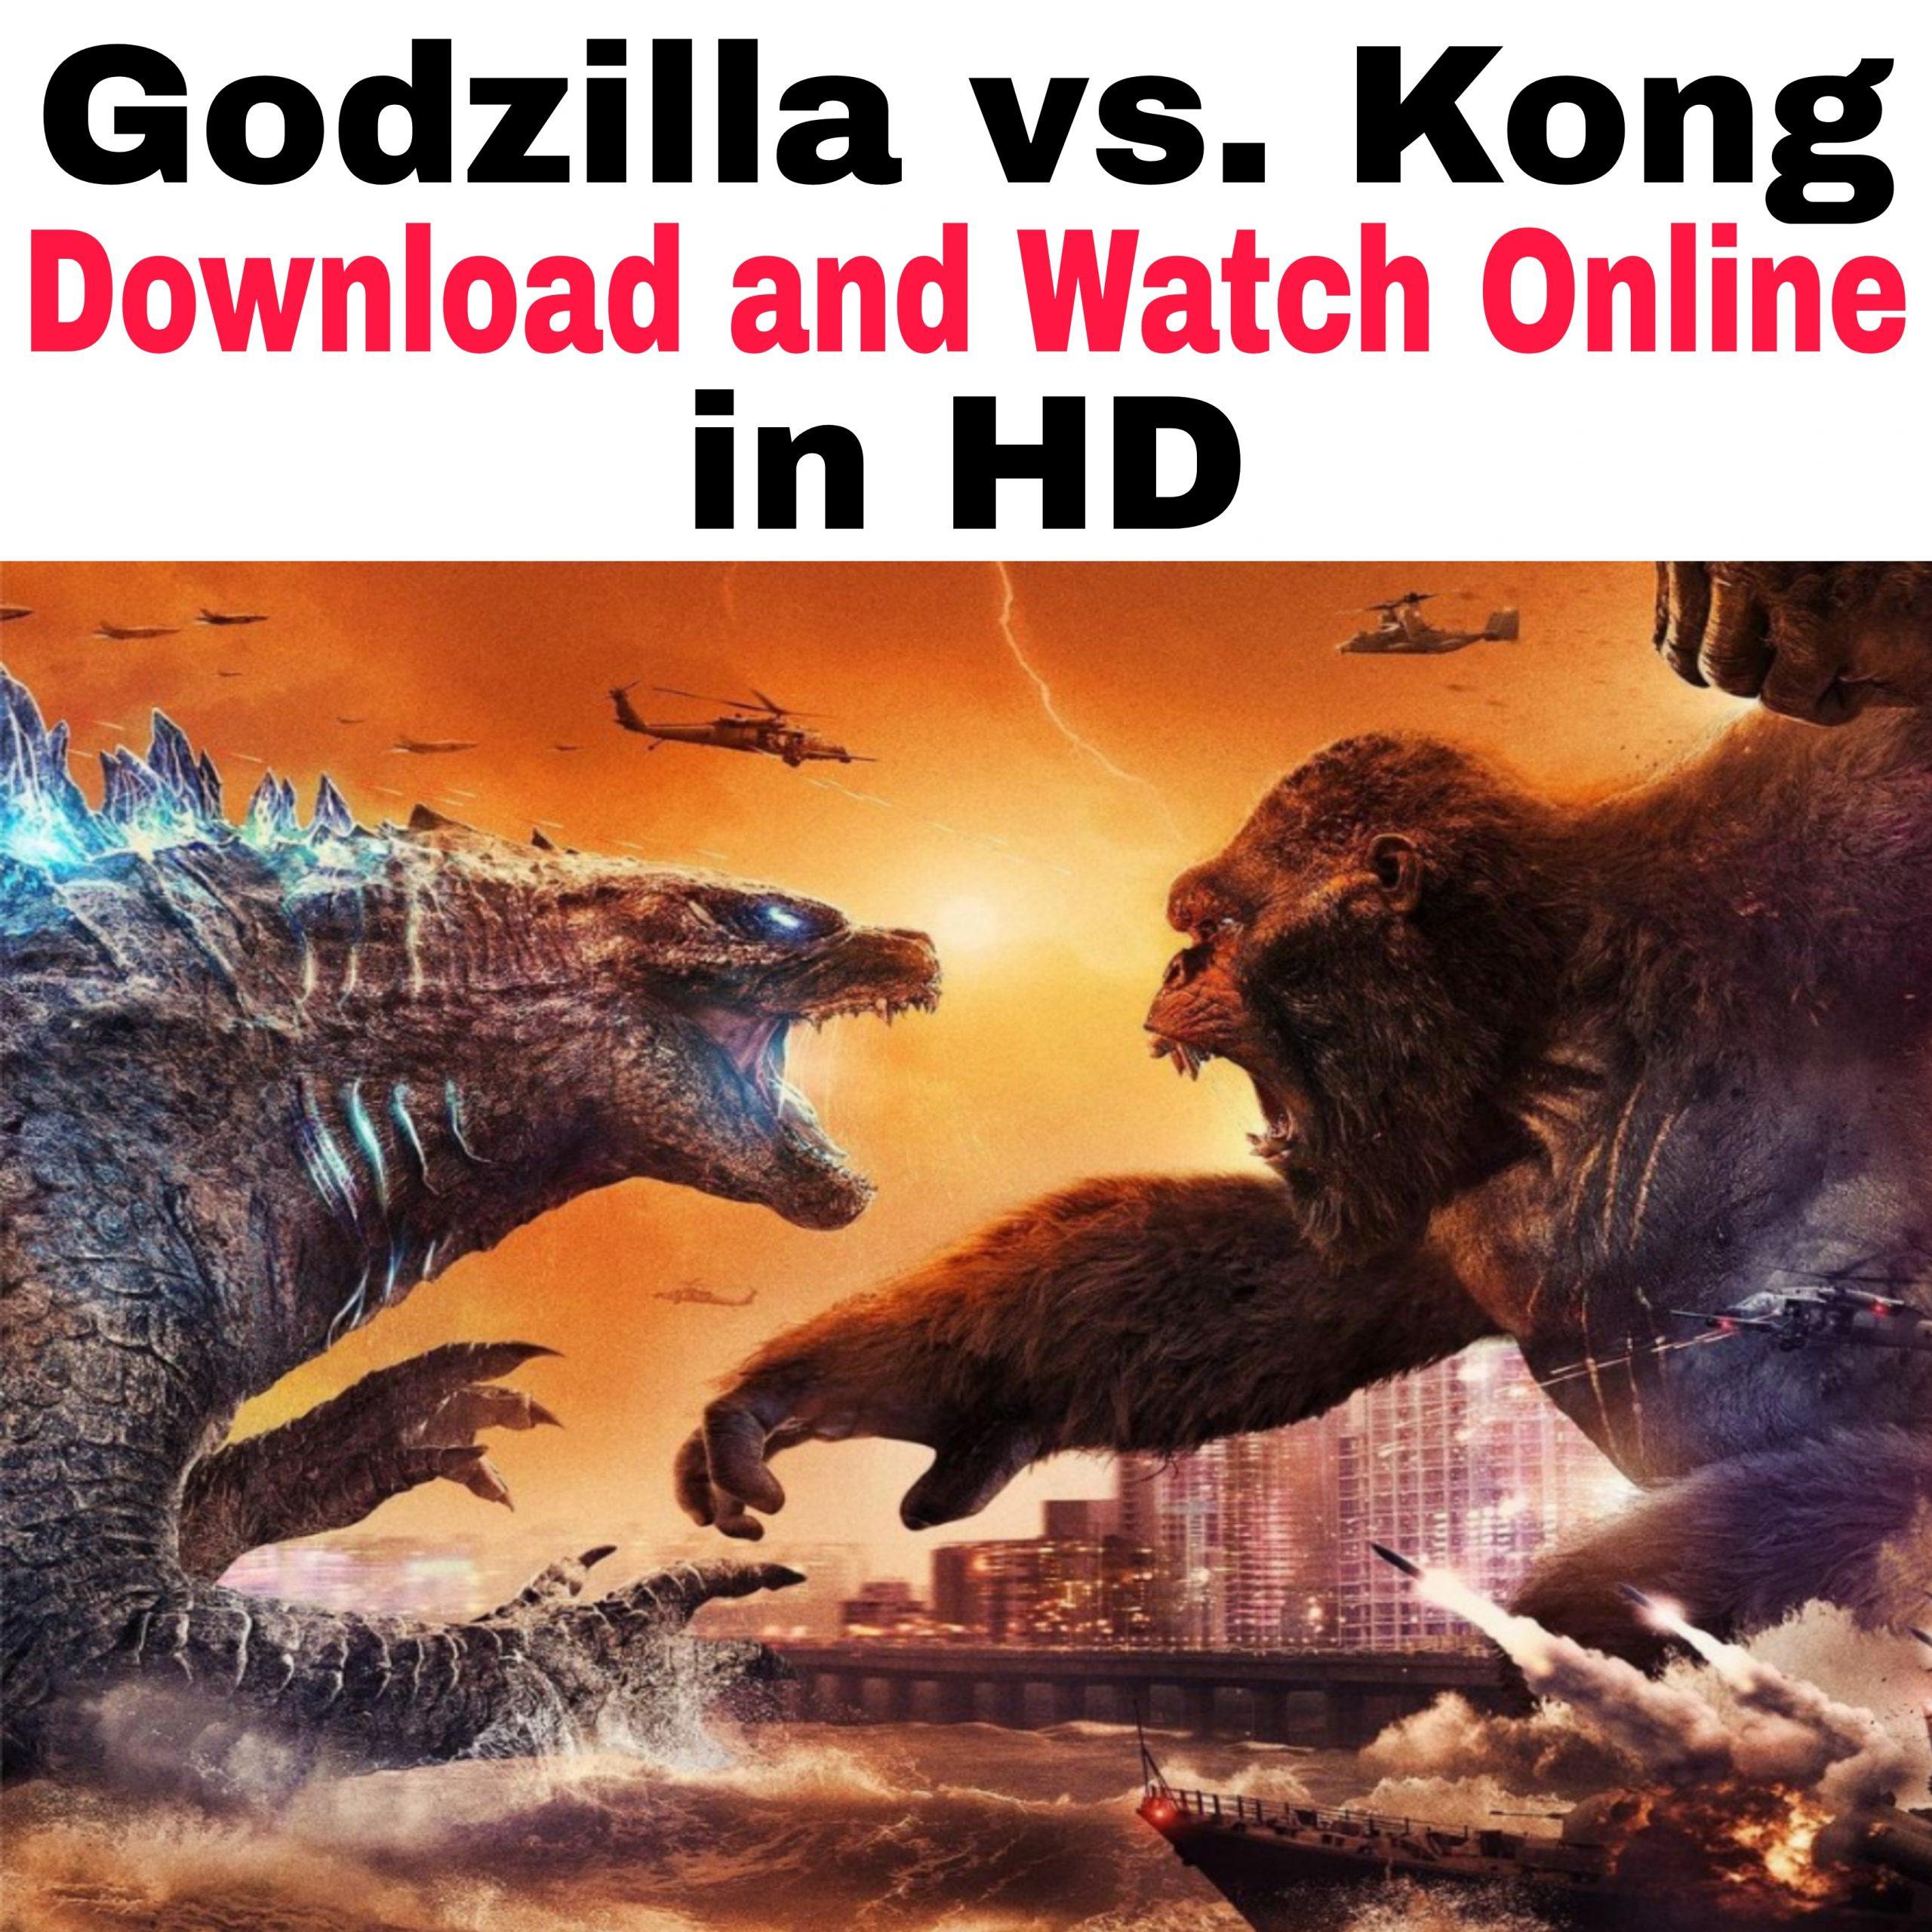 Godzilla vs Kong full movie download in isaimini